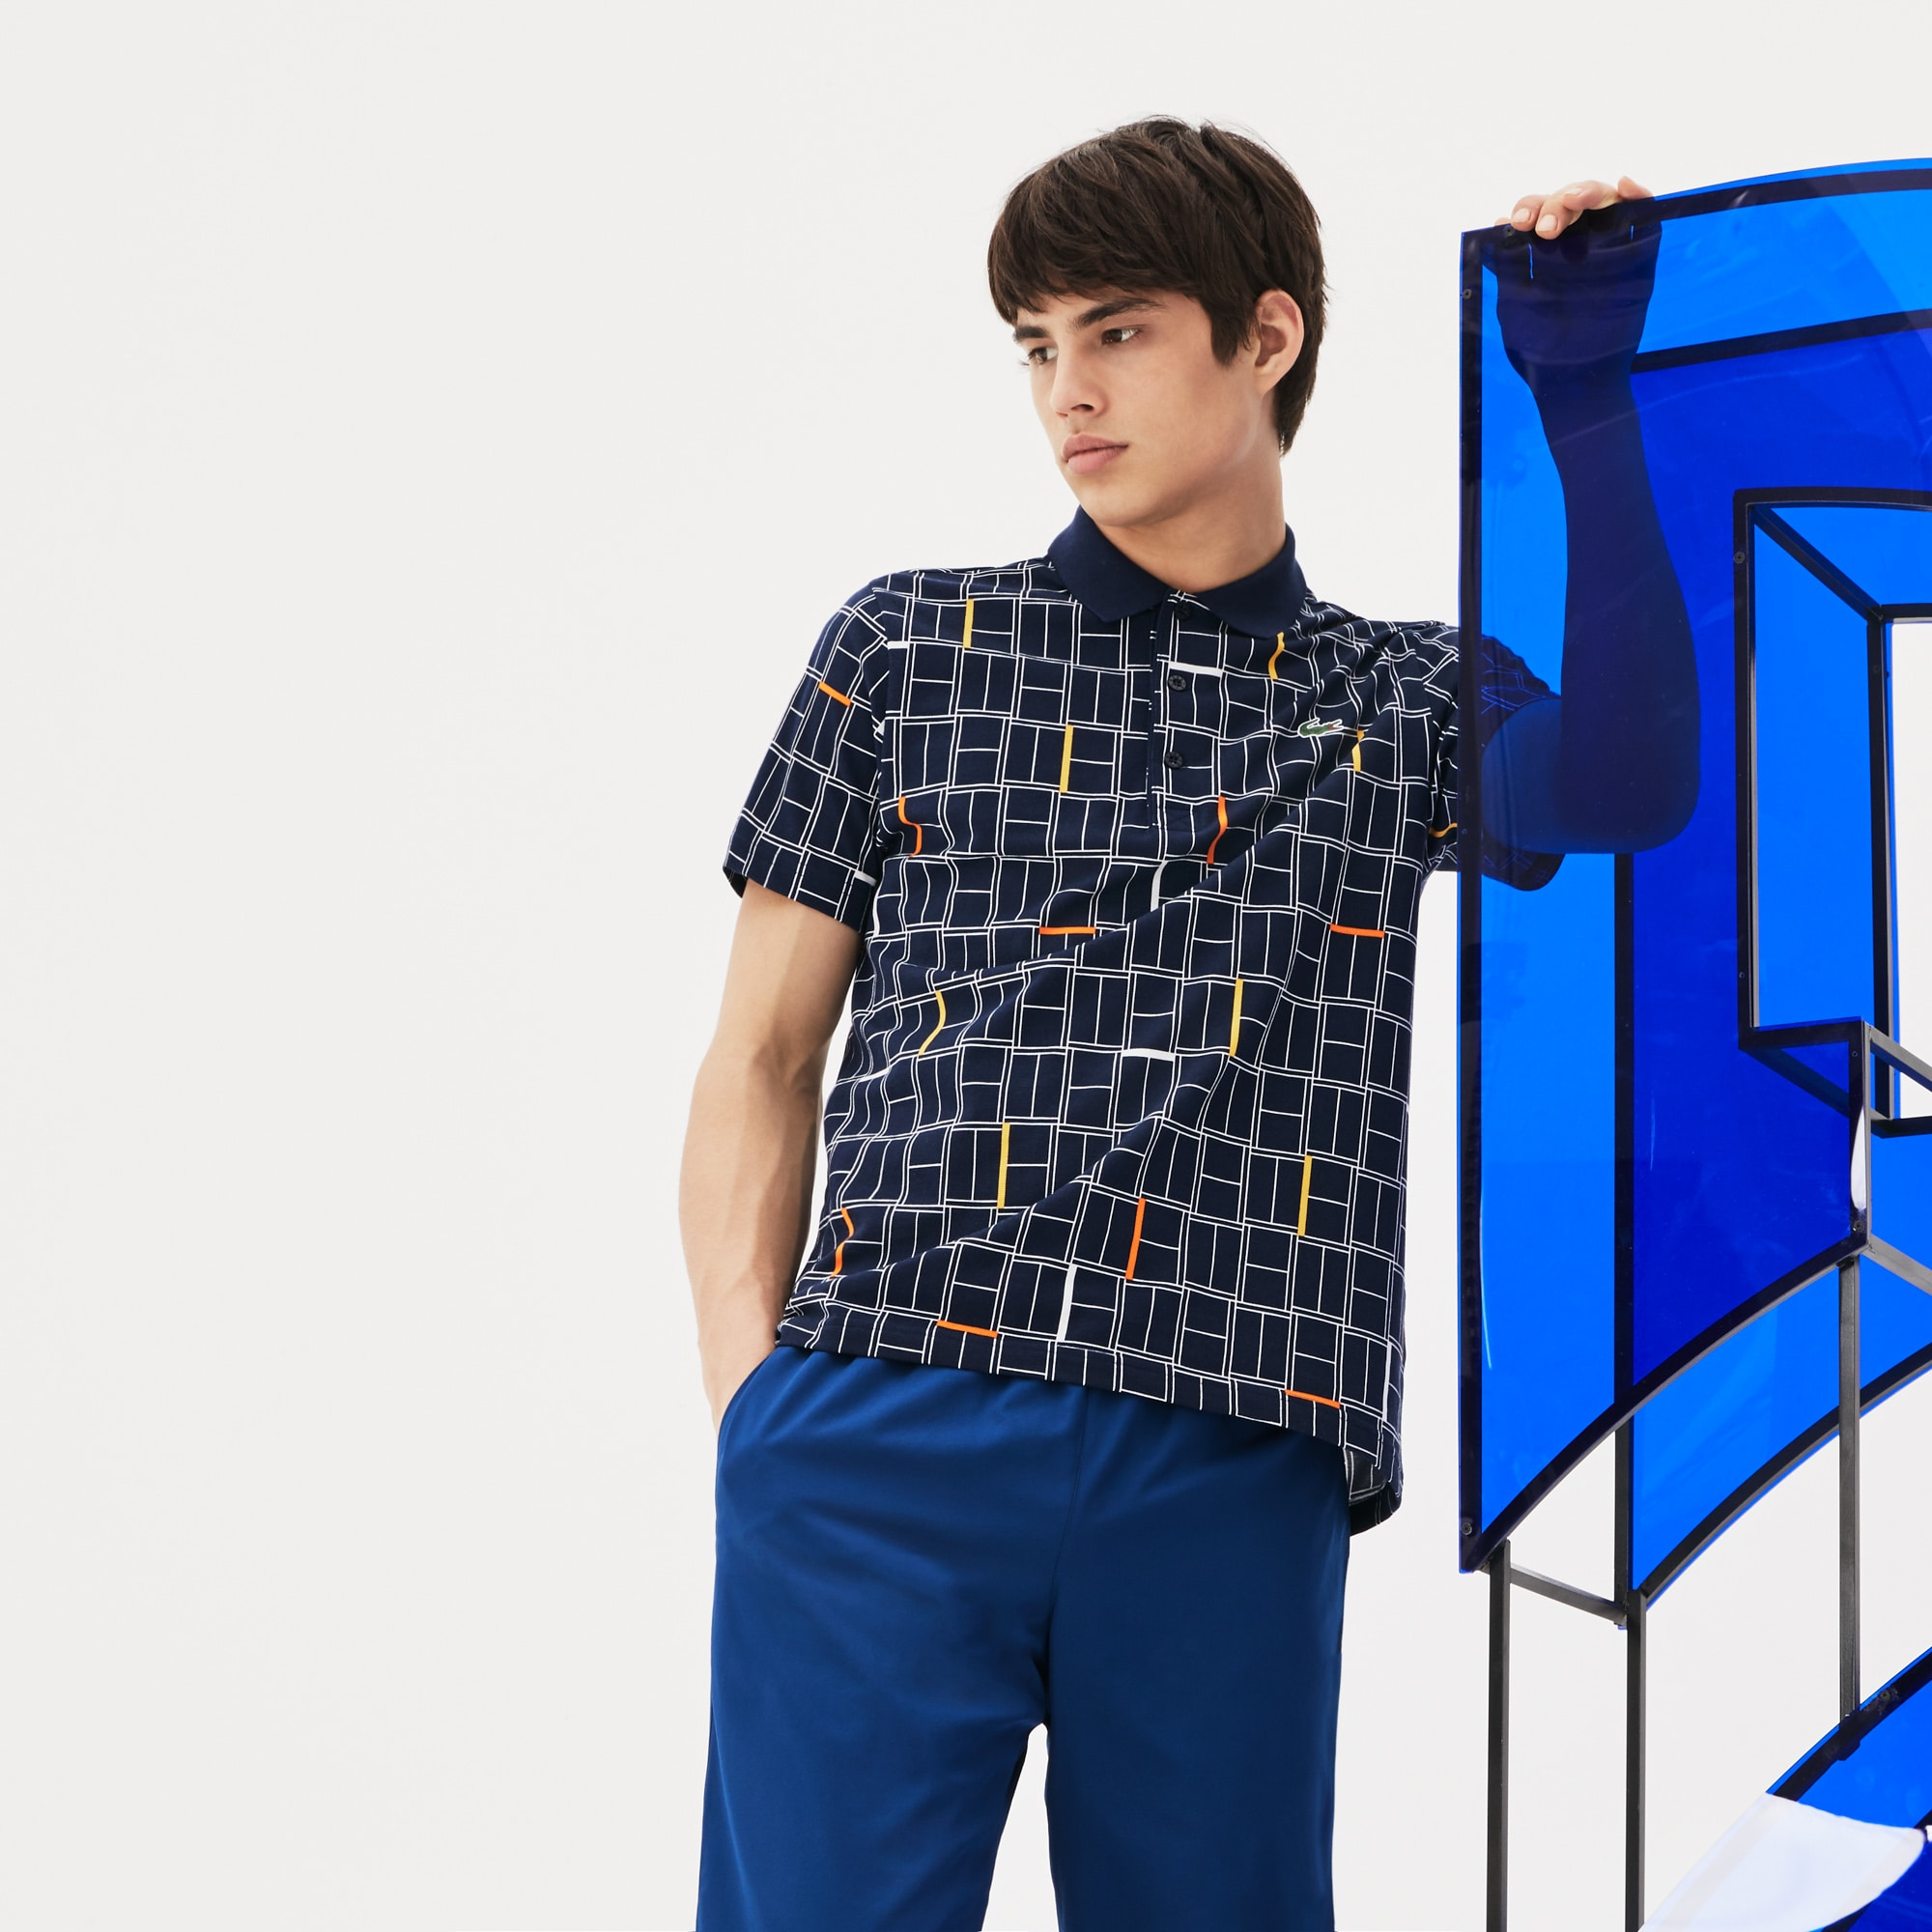 Men's LACOSTE SPORT NOVAK DJOKOVIC COLLECTION Print Ultra-Light Cotton Polo Shirt